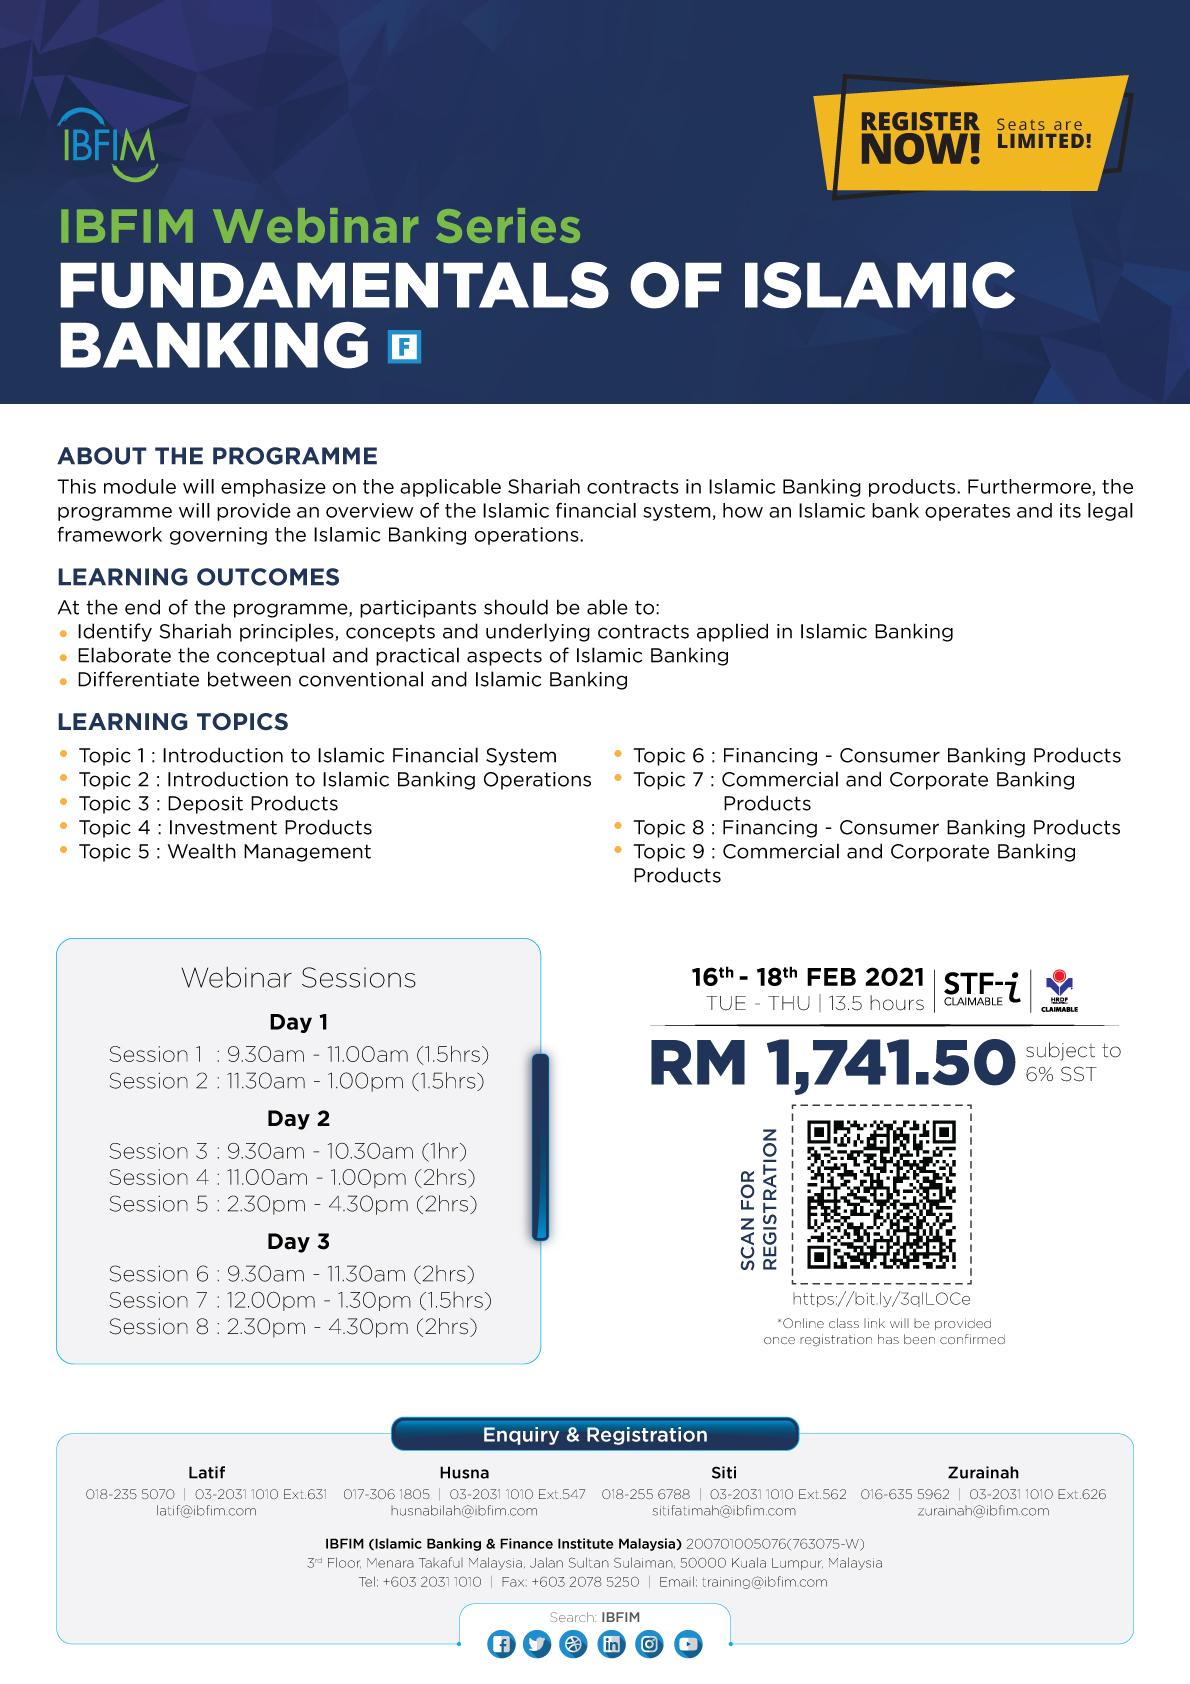 FCIBT -Fundamentals of Islamic Banking